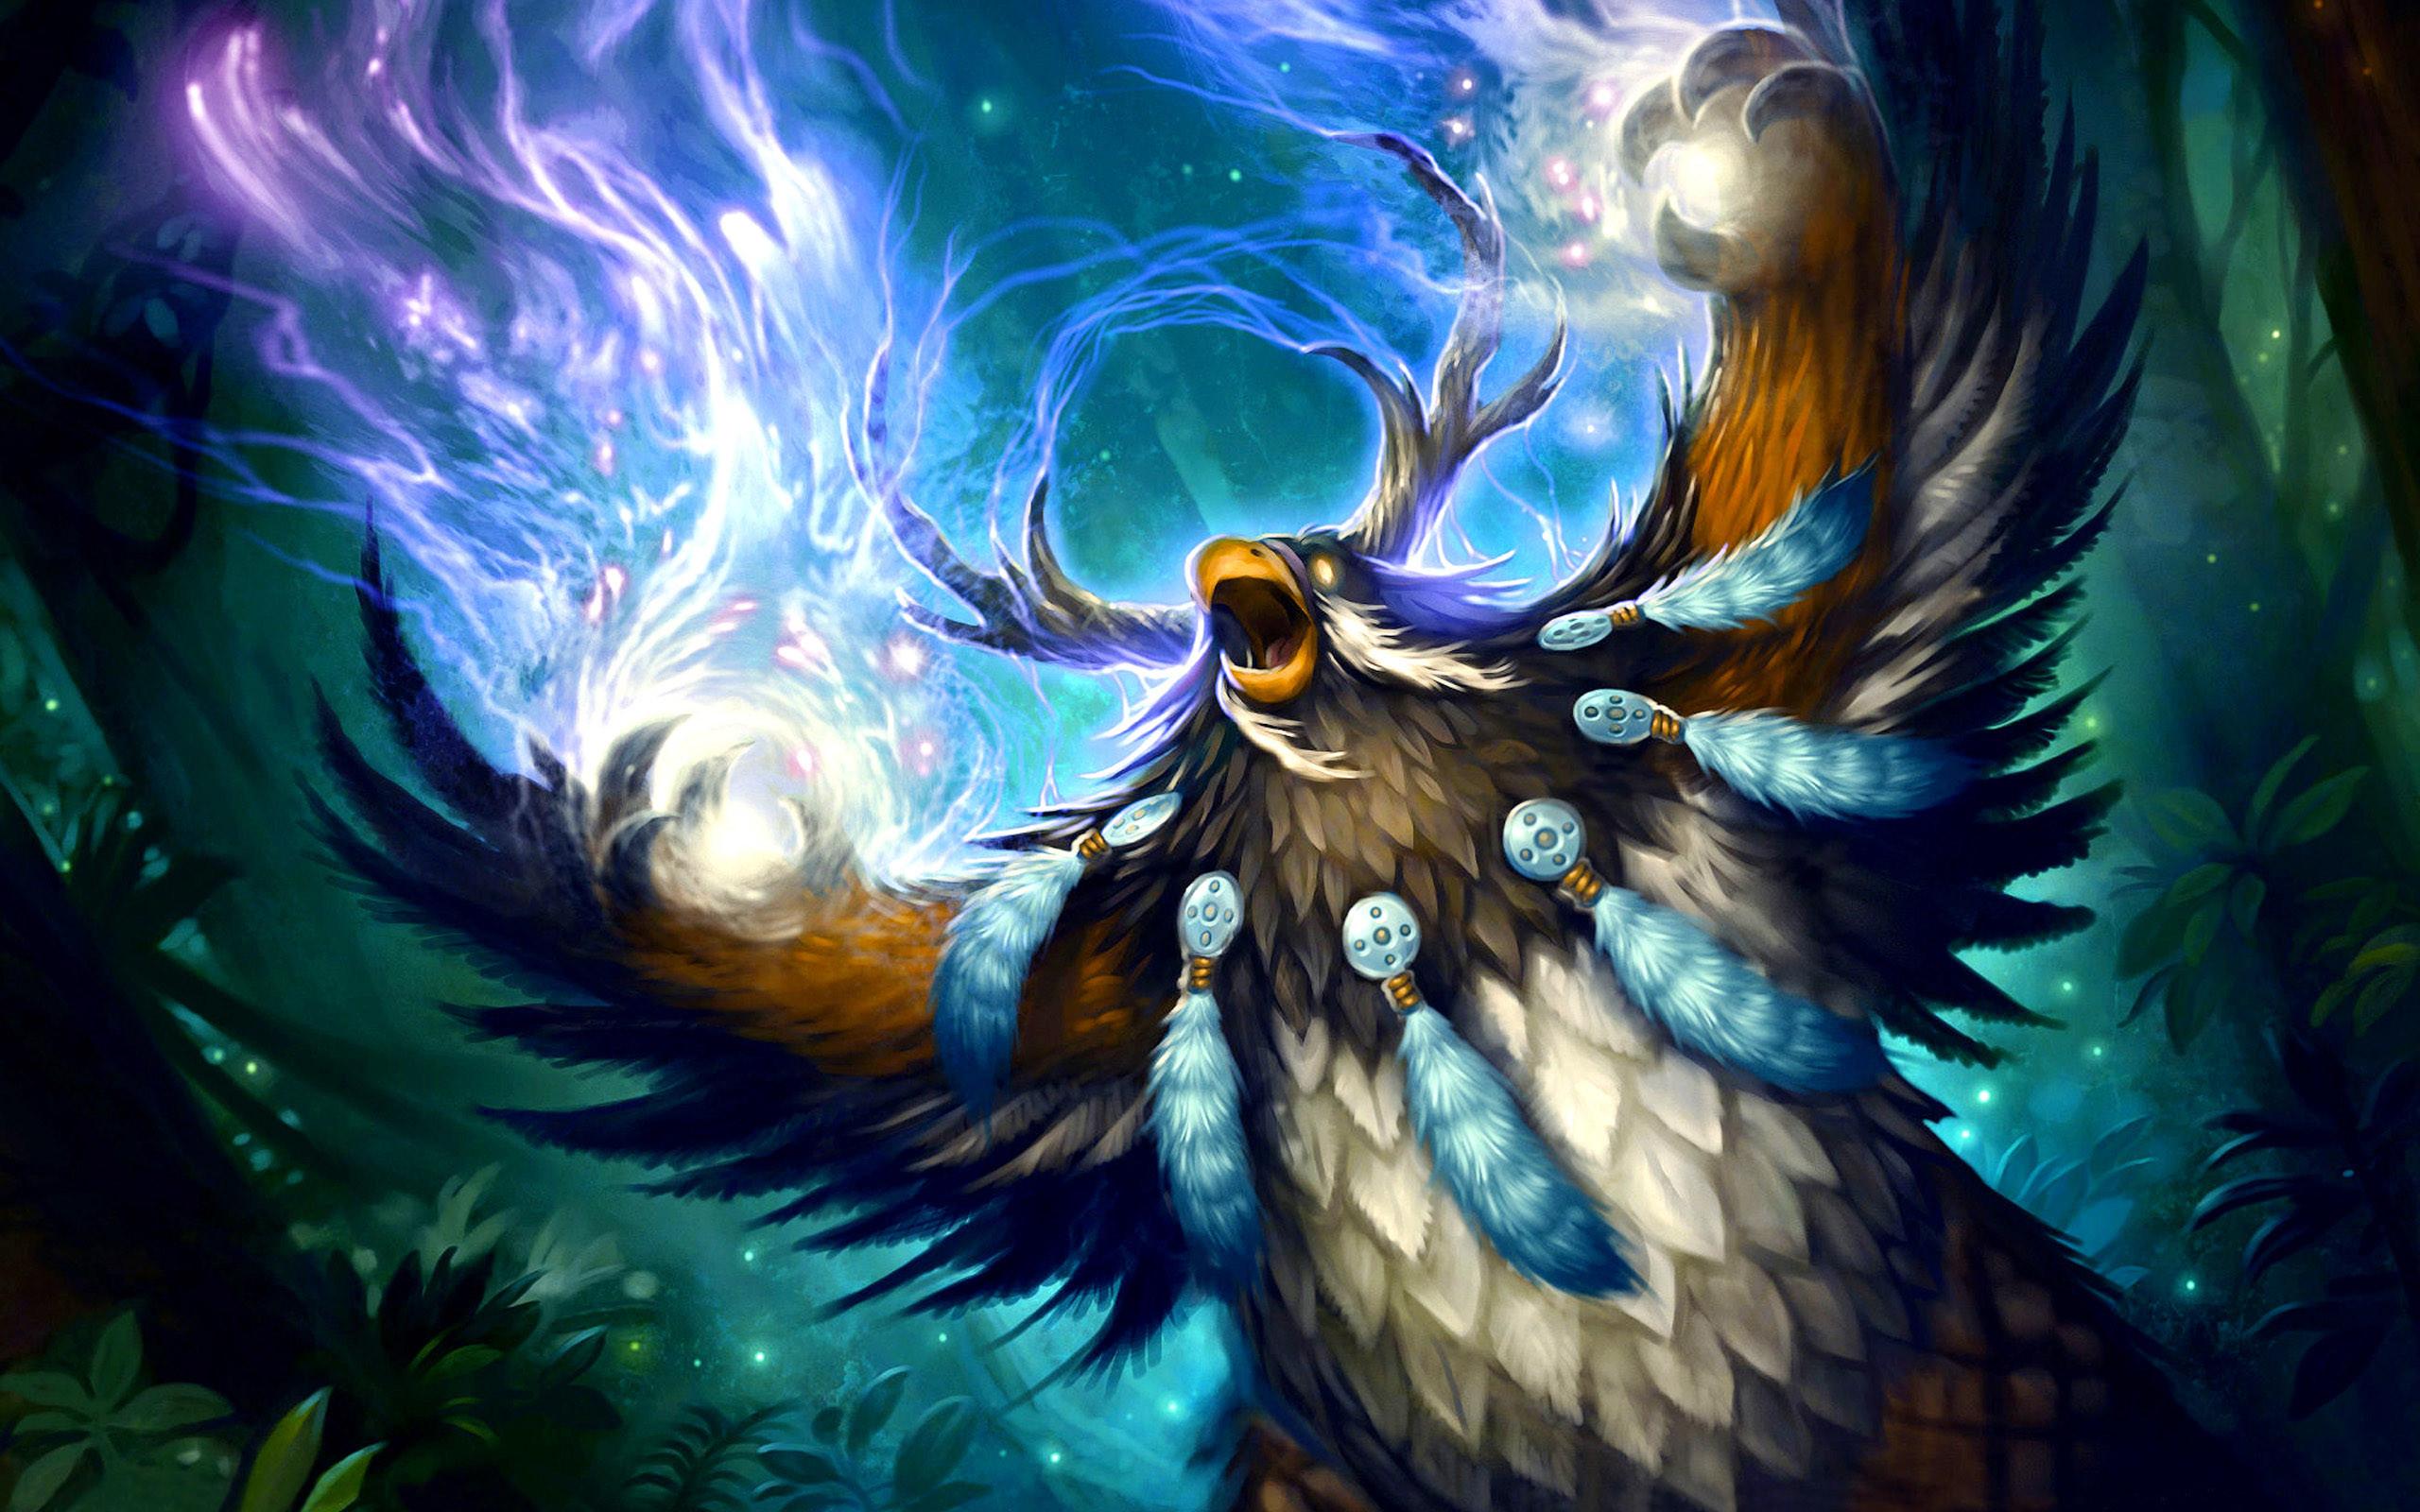 World Of Warcraft Wallpapers Hd 1080P Wallpaper 101465 | Wallpapers |  Pinterest